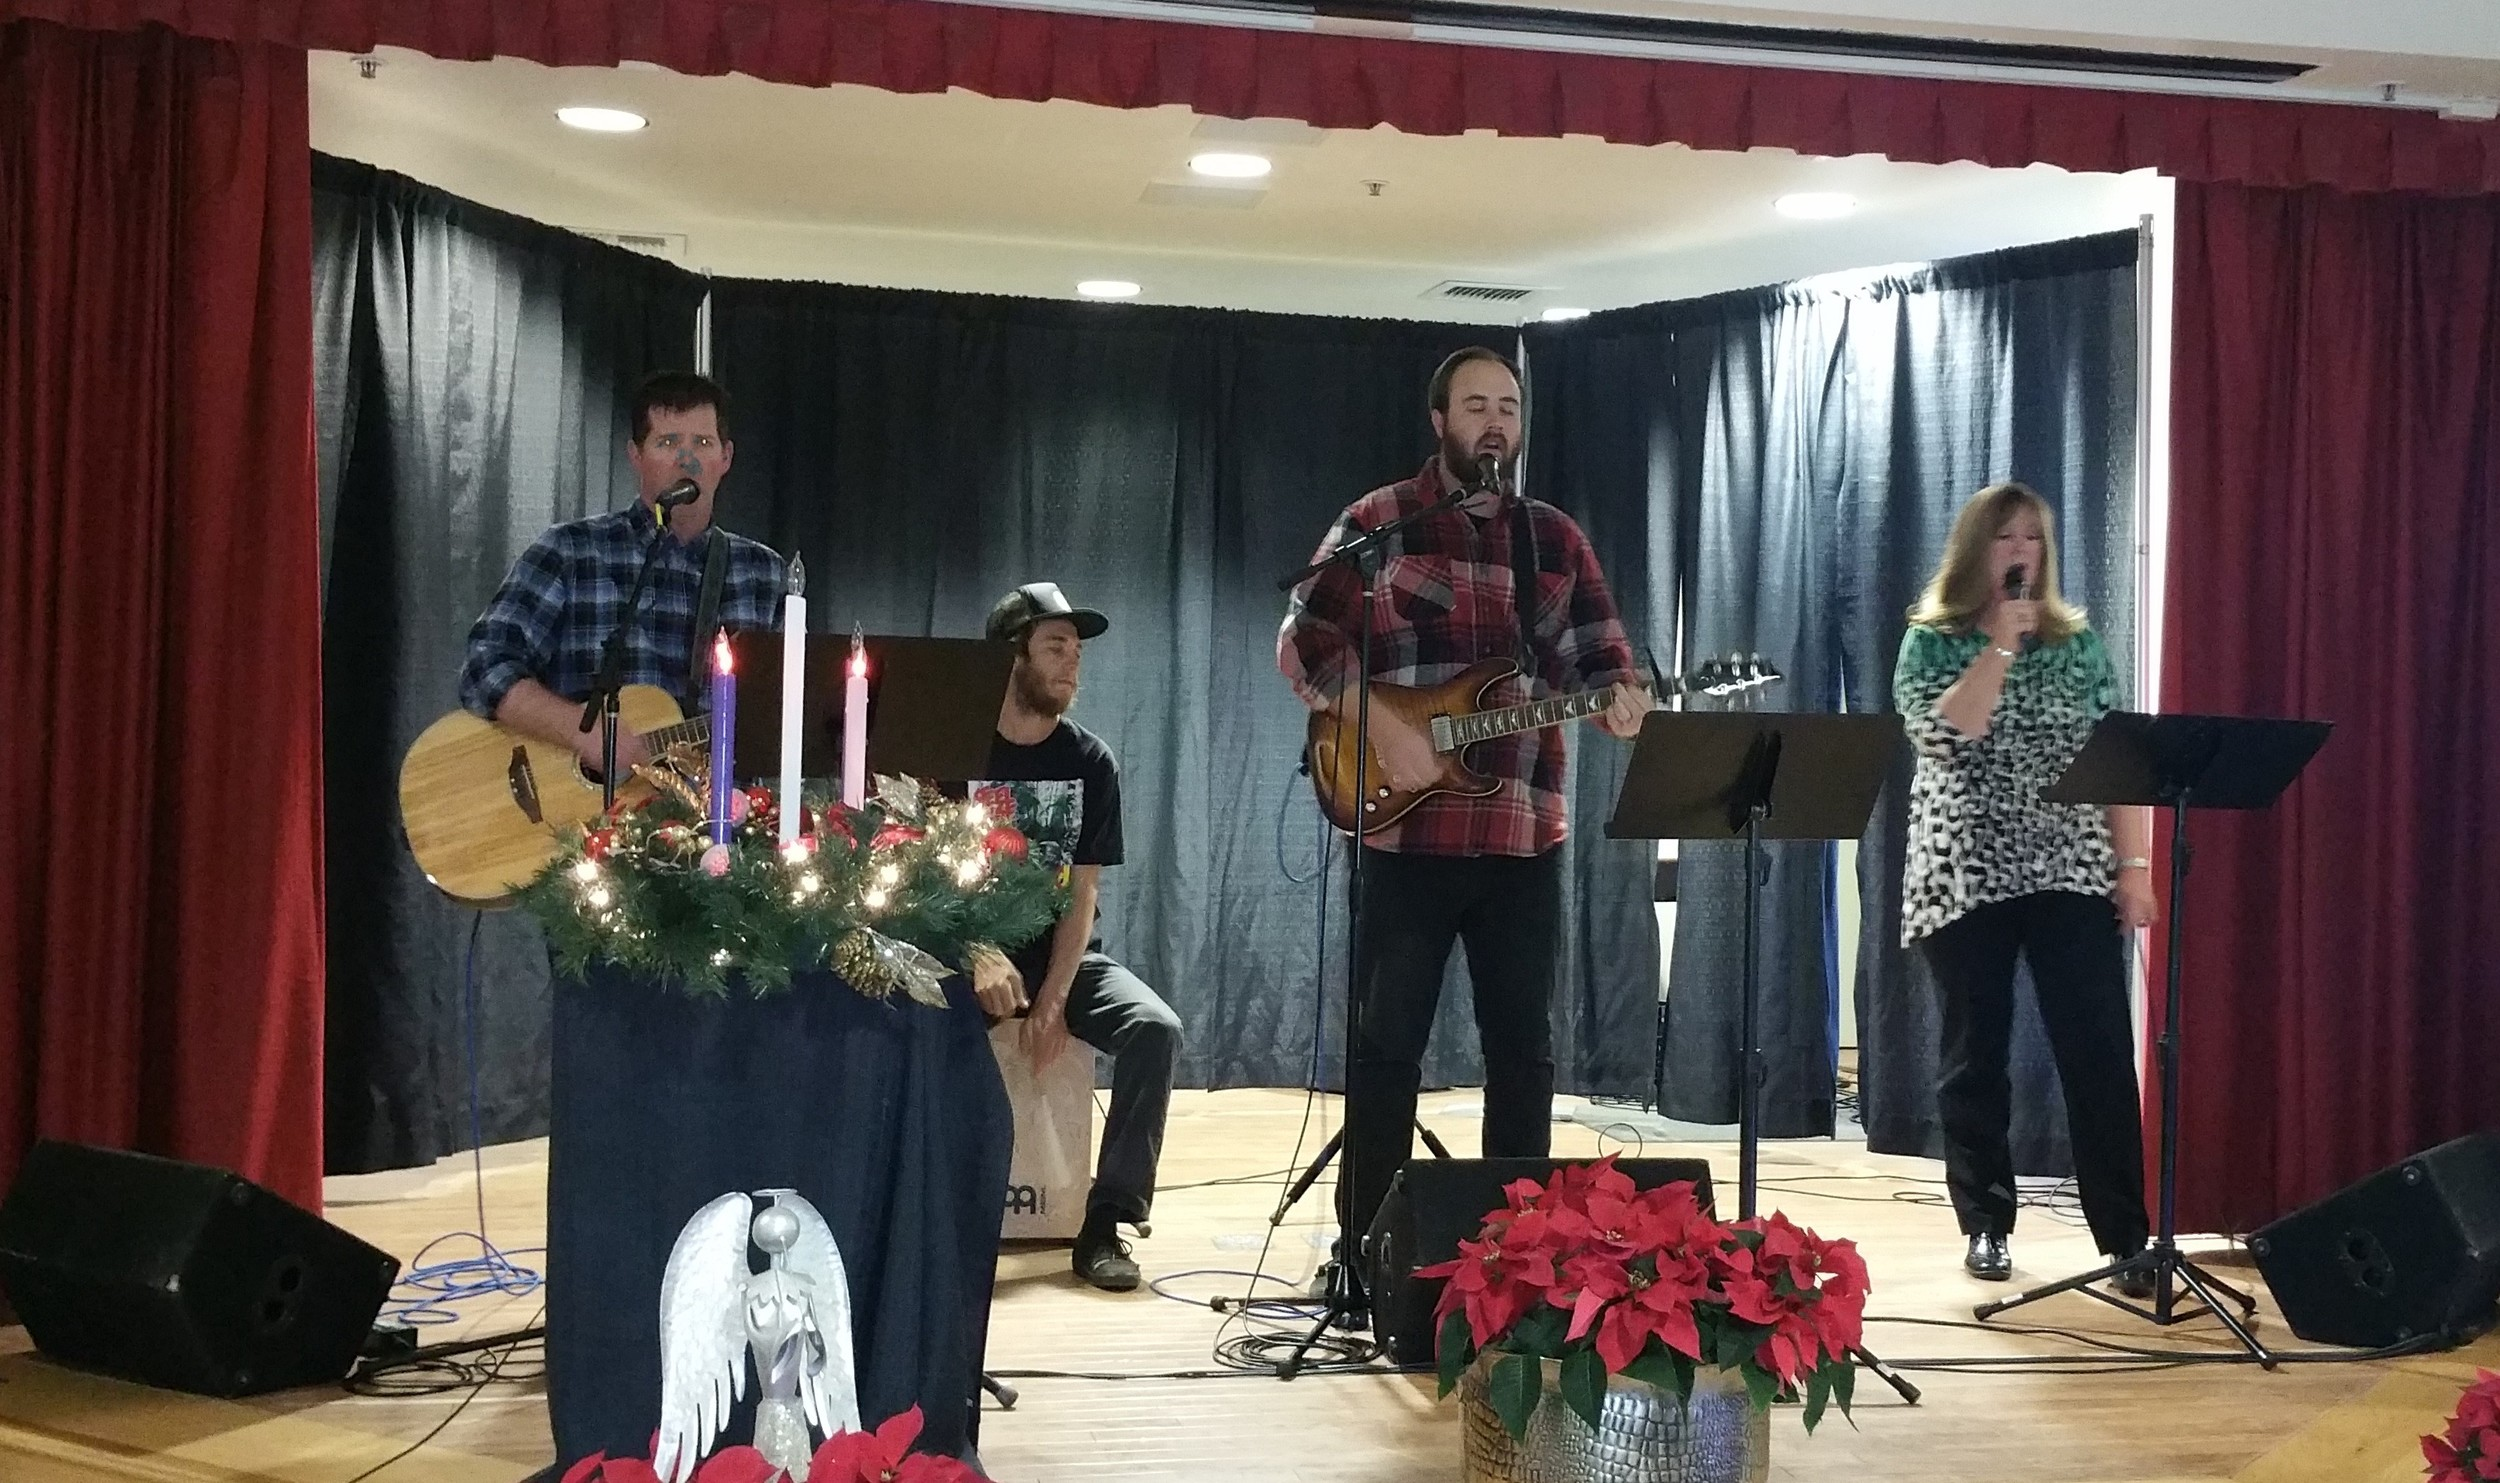 Stone creek bible church worship team